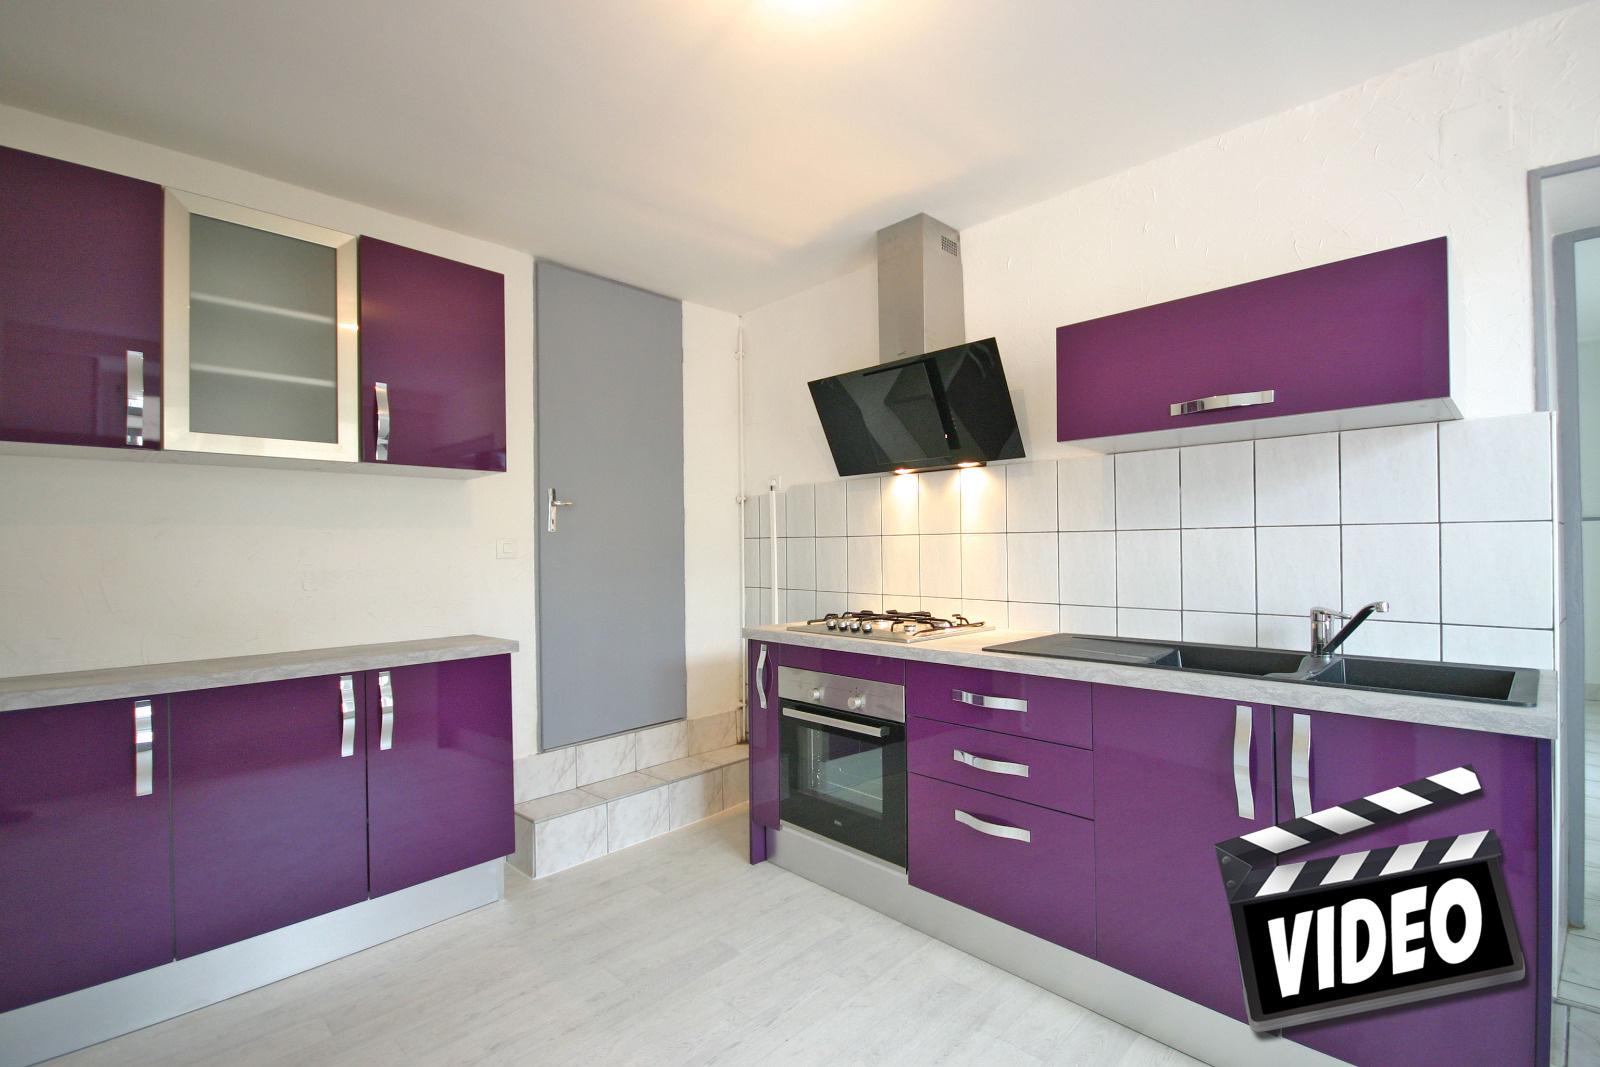 maison/villa à vendre darney